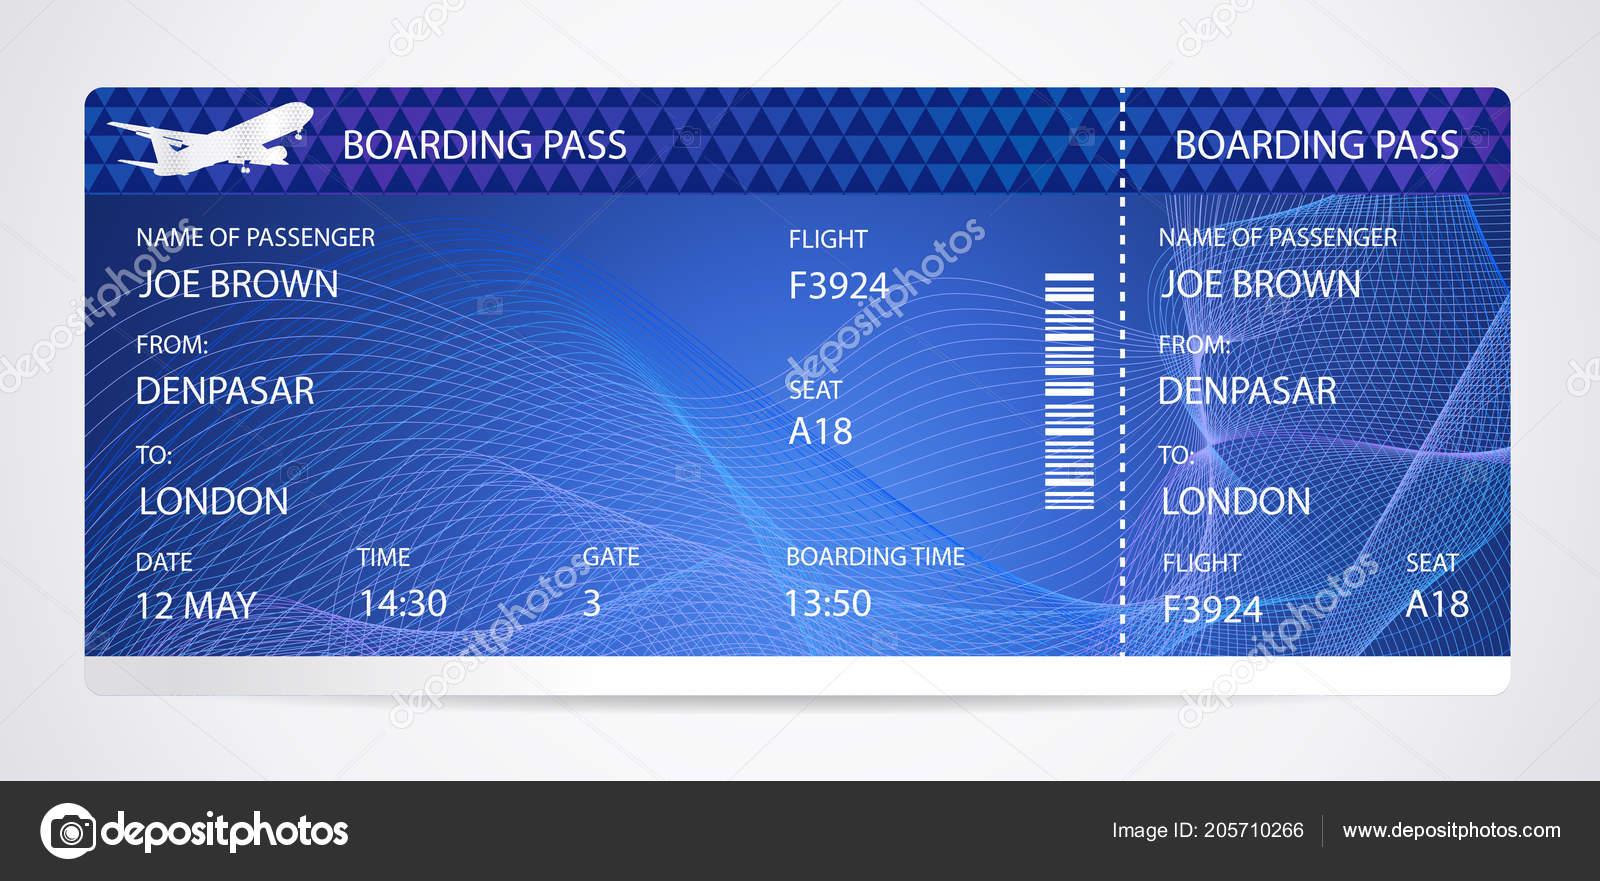 Bordkarte Flugticket Traveler Check Vorlage Mit Flugzeug